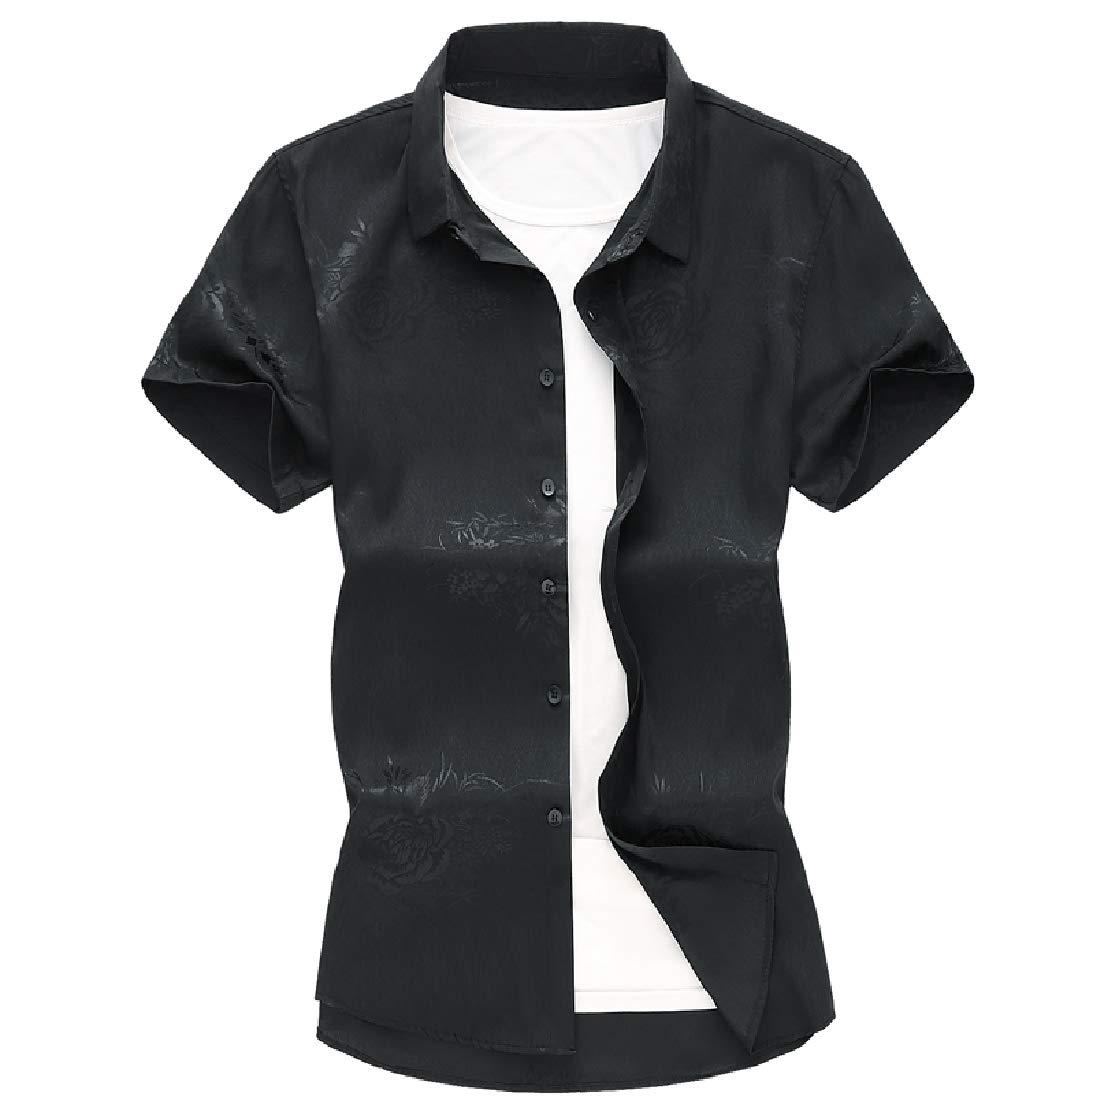 KLJR Men Jacquard Button Front Slim Short Sleeve Big /& Tall Shirts